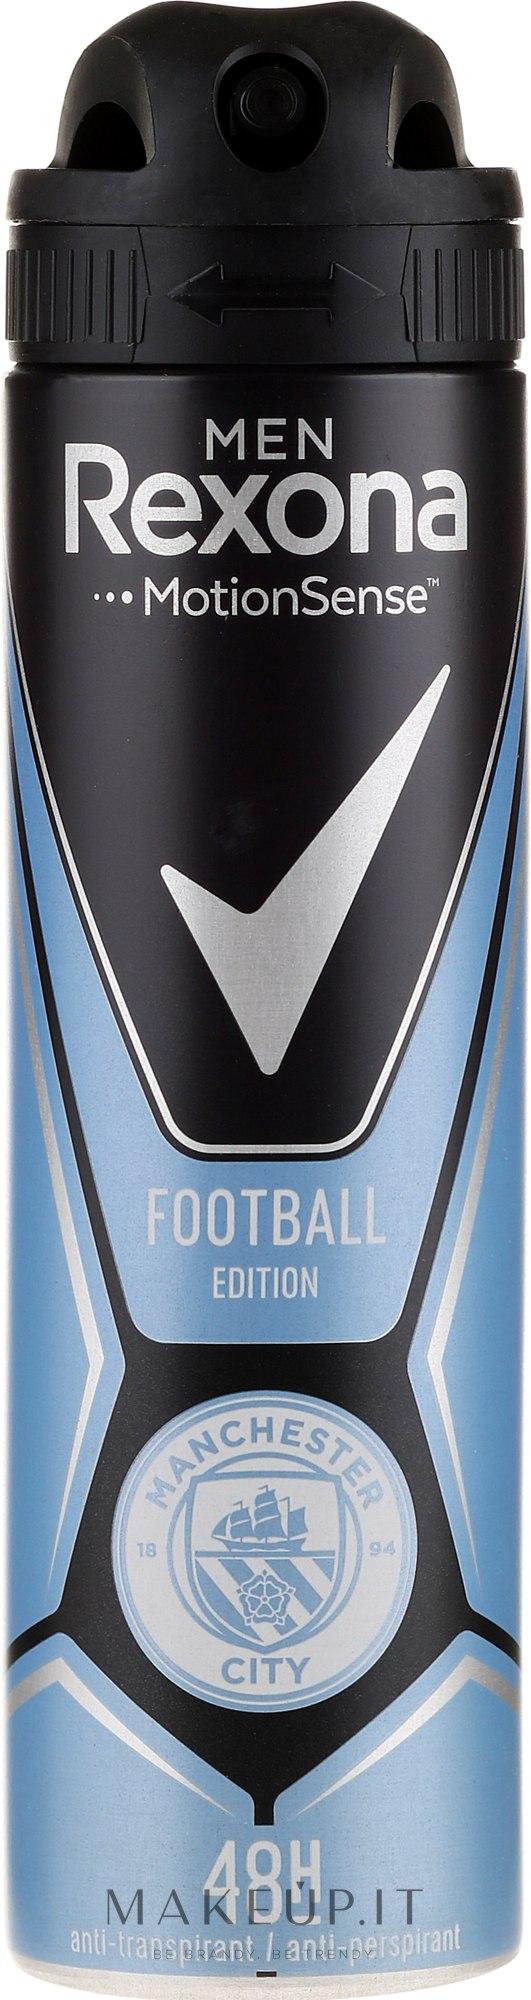 Antitraspirante-spray - Rexona Manchester City Spray — foto 150 ml